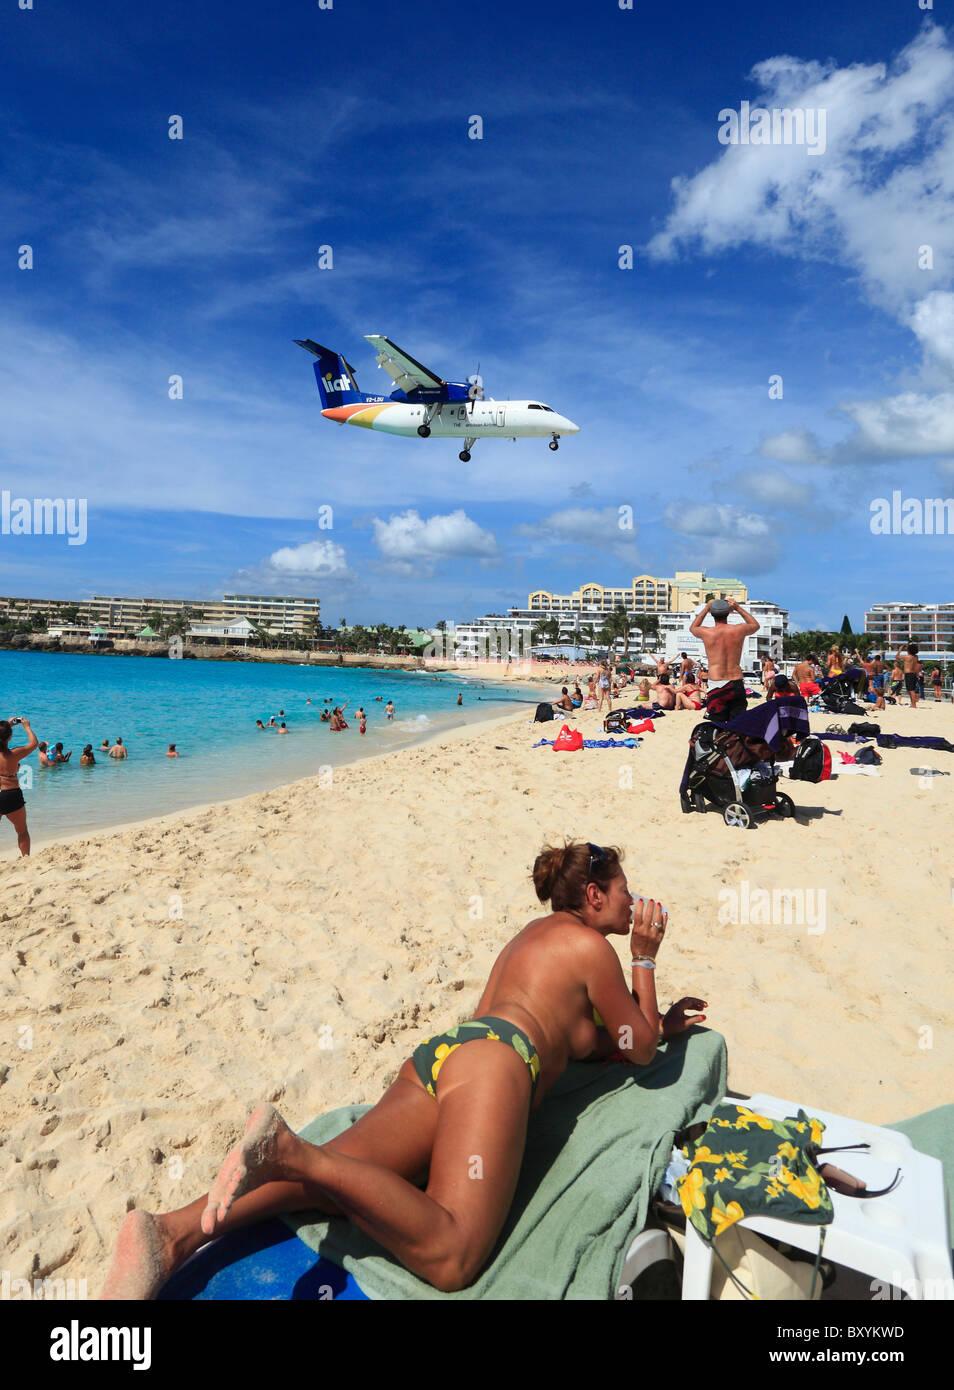 liat islander aircraft landing